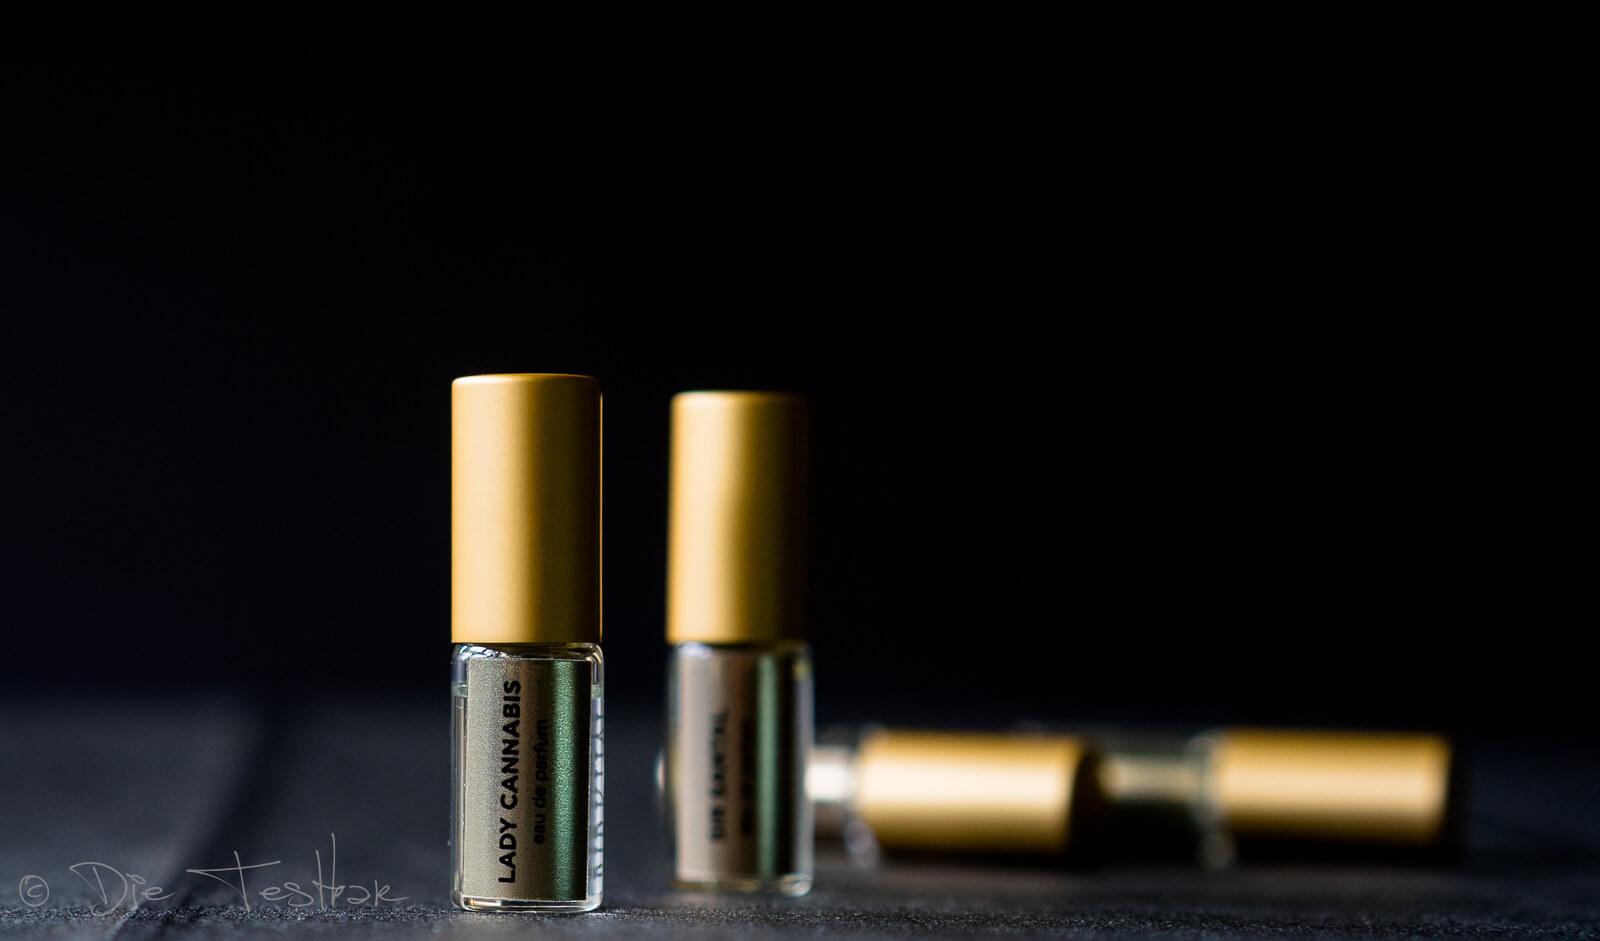 Woody Collection Sommelier-Set von Birkholz Perfume Manufacture